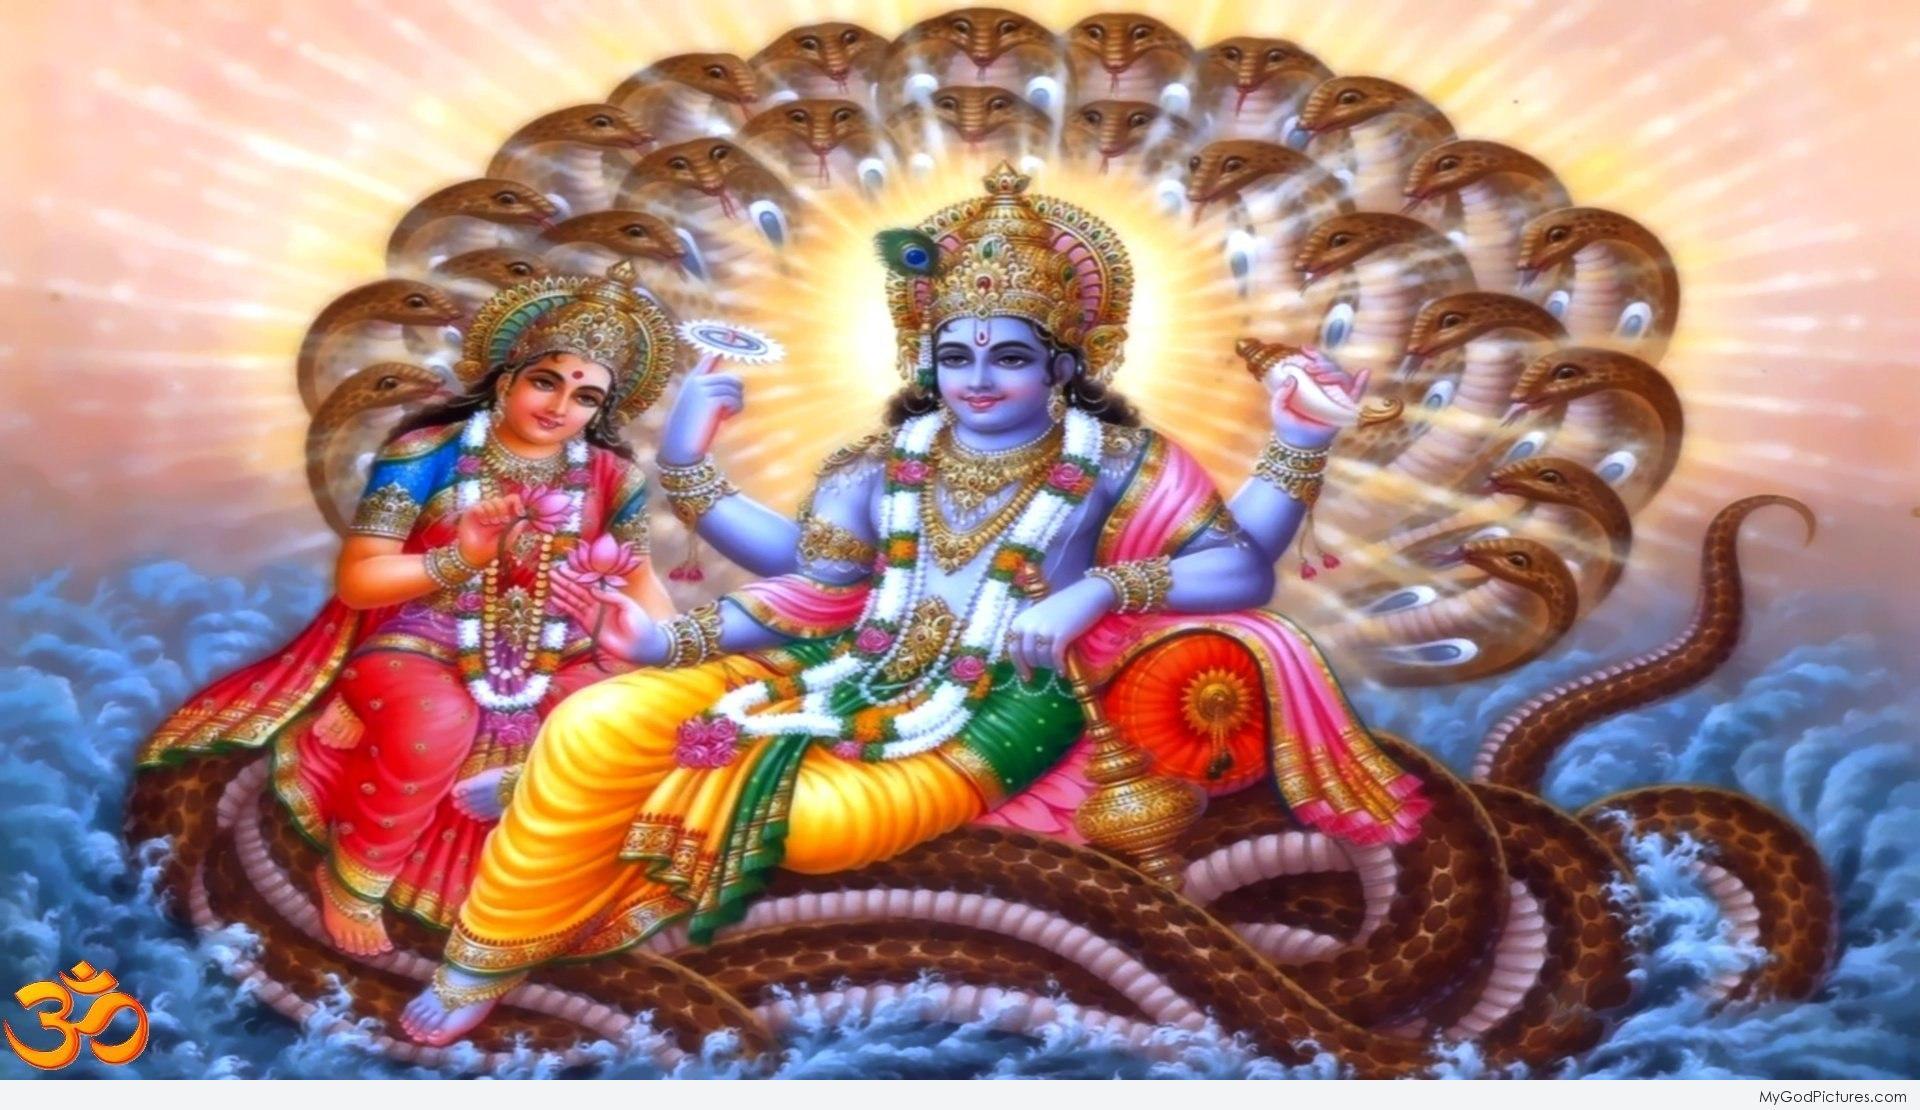 Mahabharat krishna images hd wallpaper